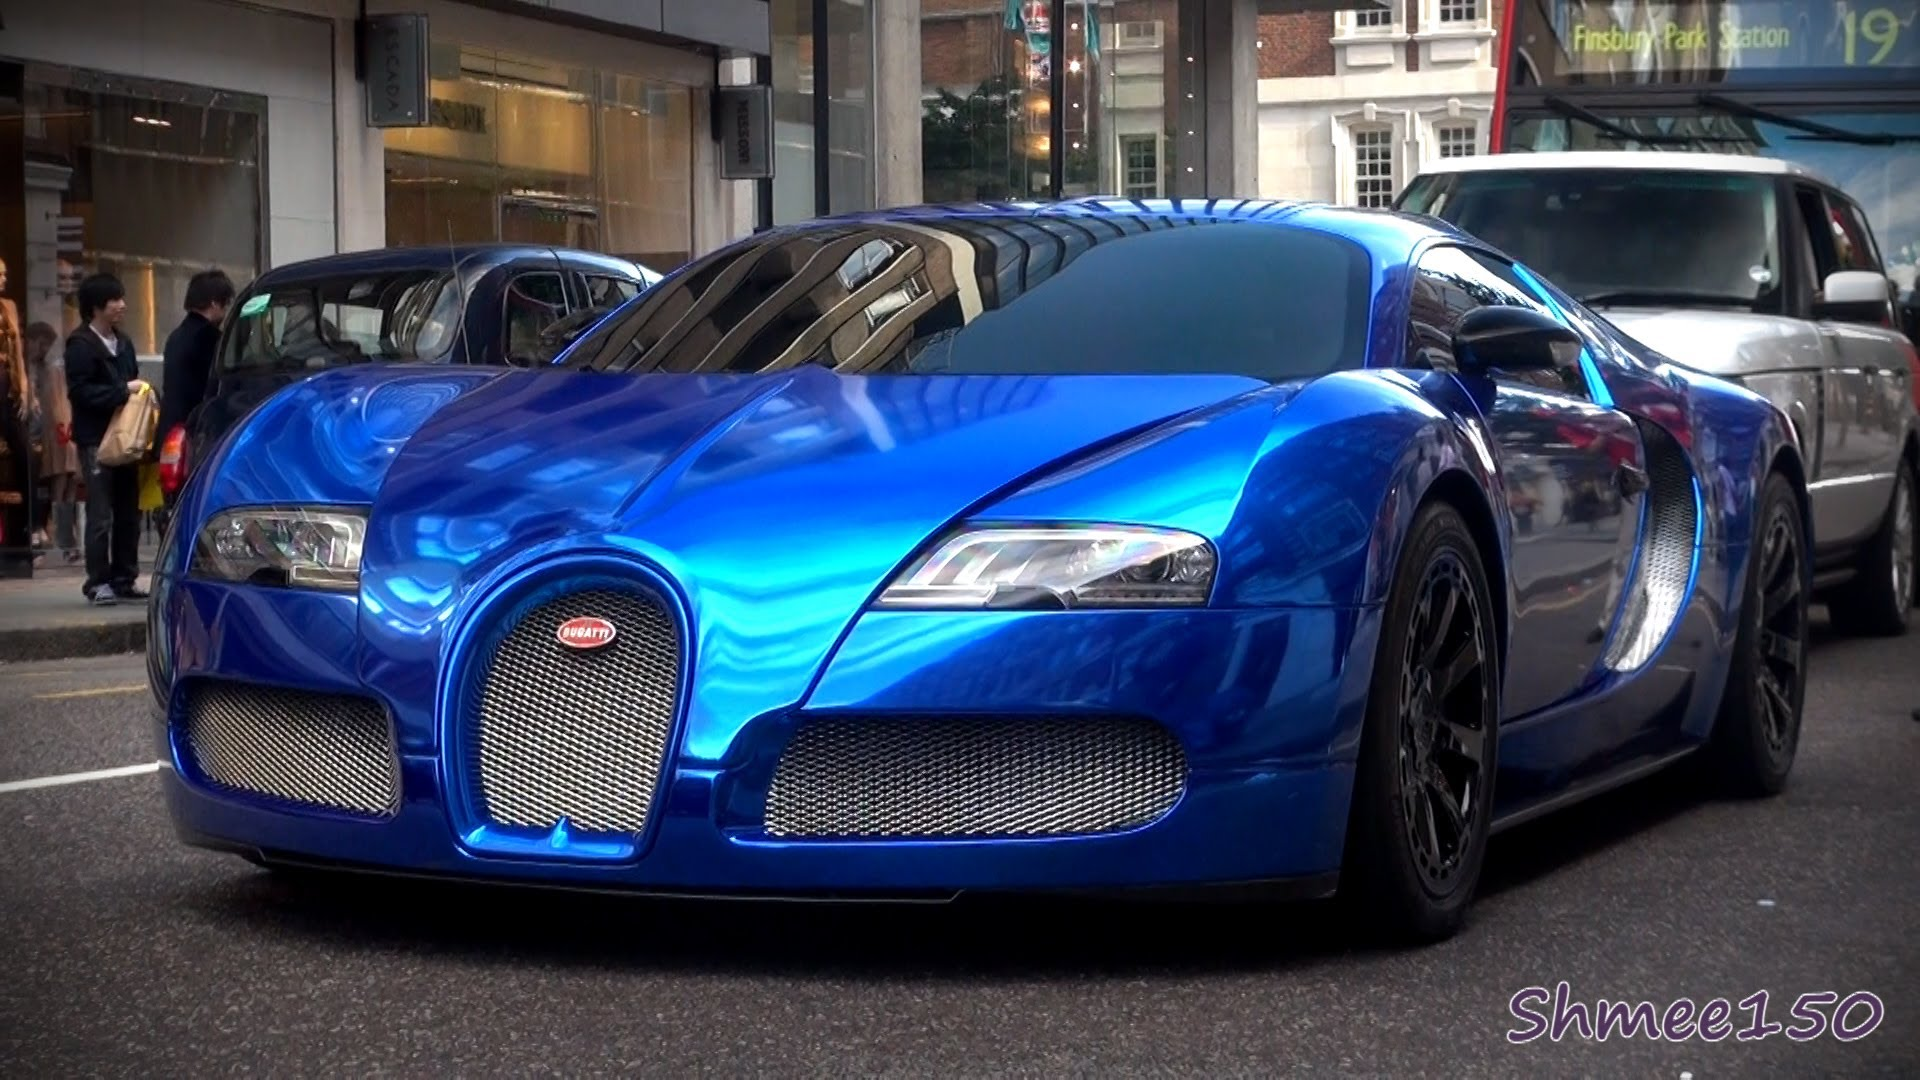 BLUE CHROME Bugatti Veyron Centenaire - Driving in London